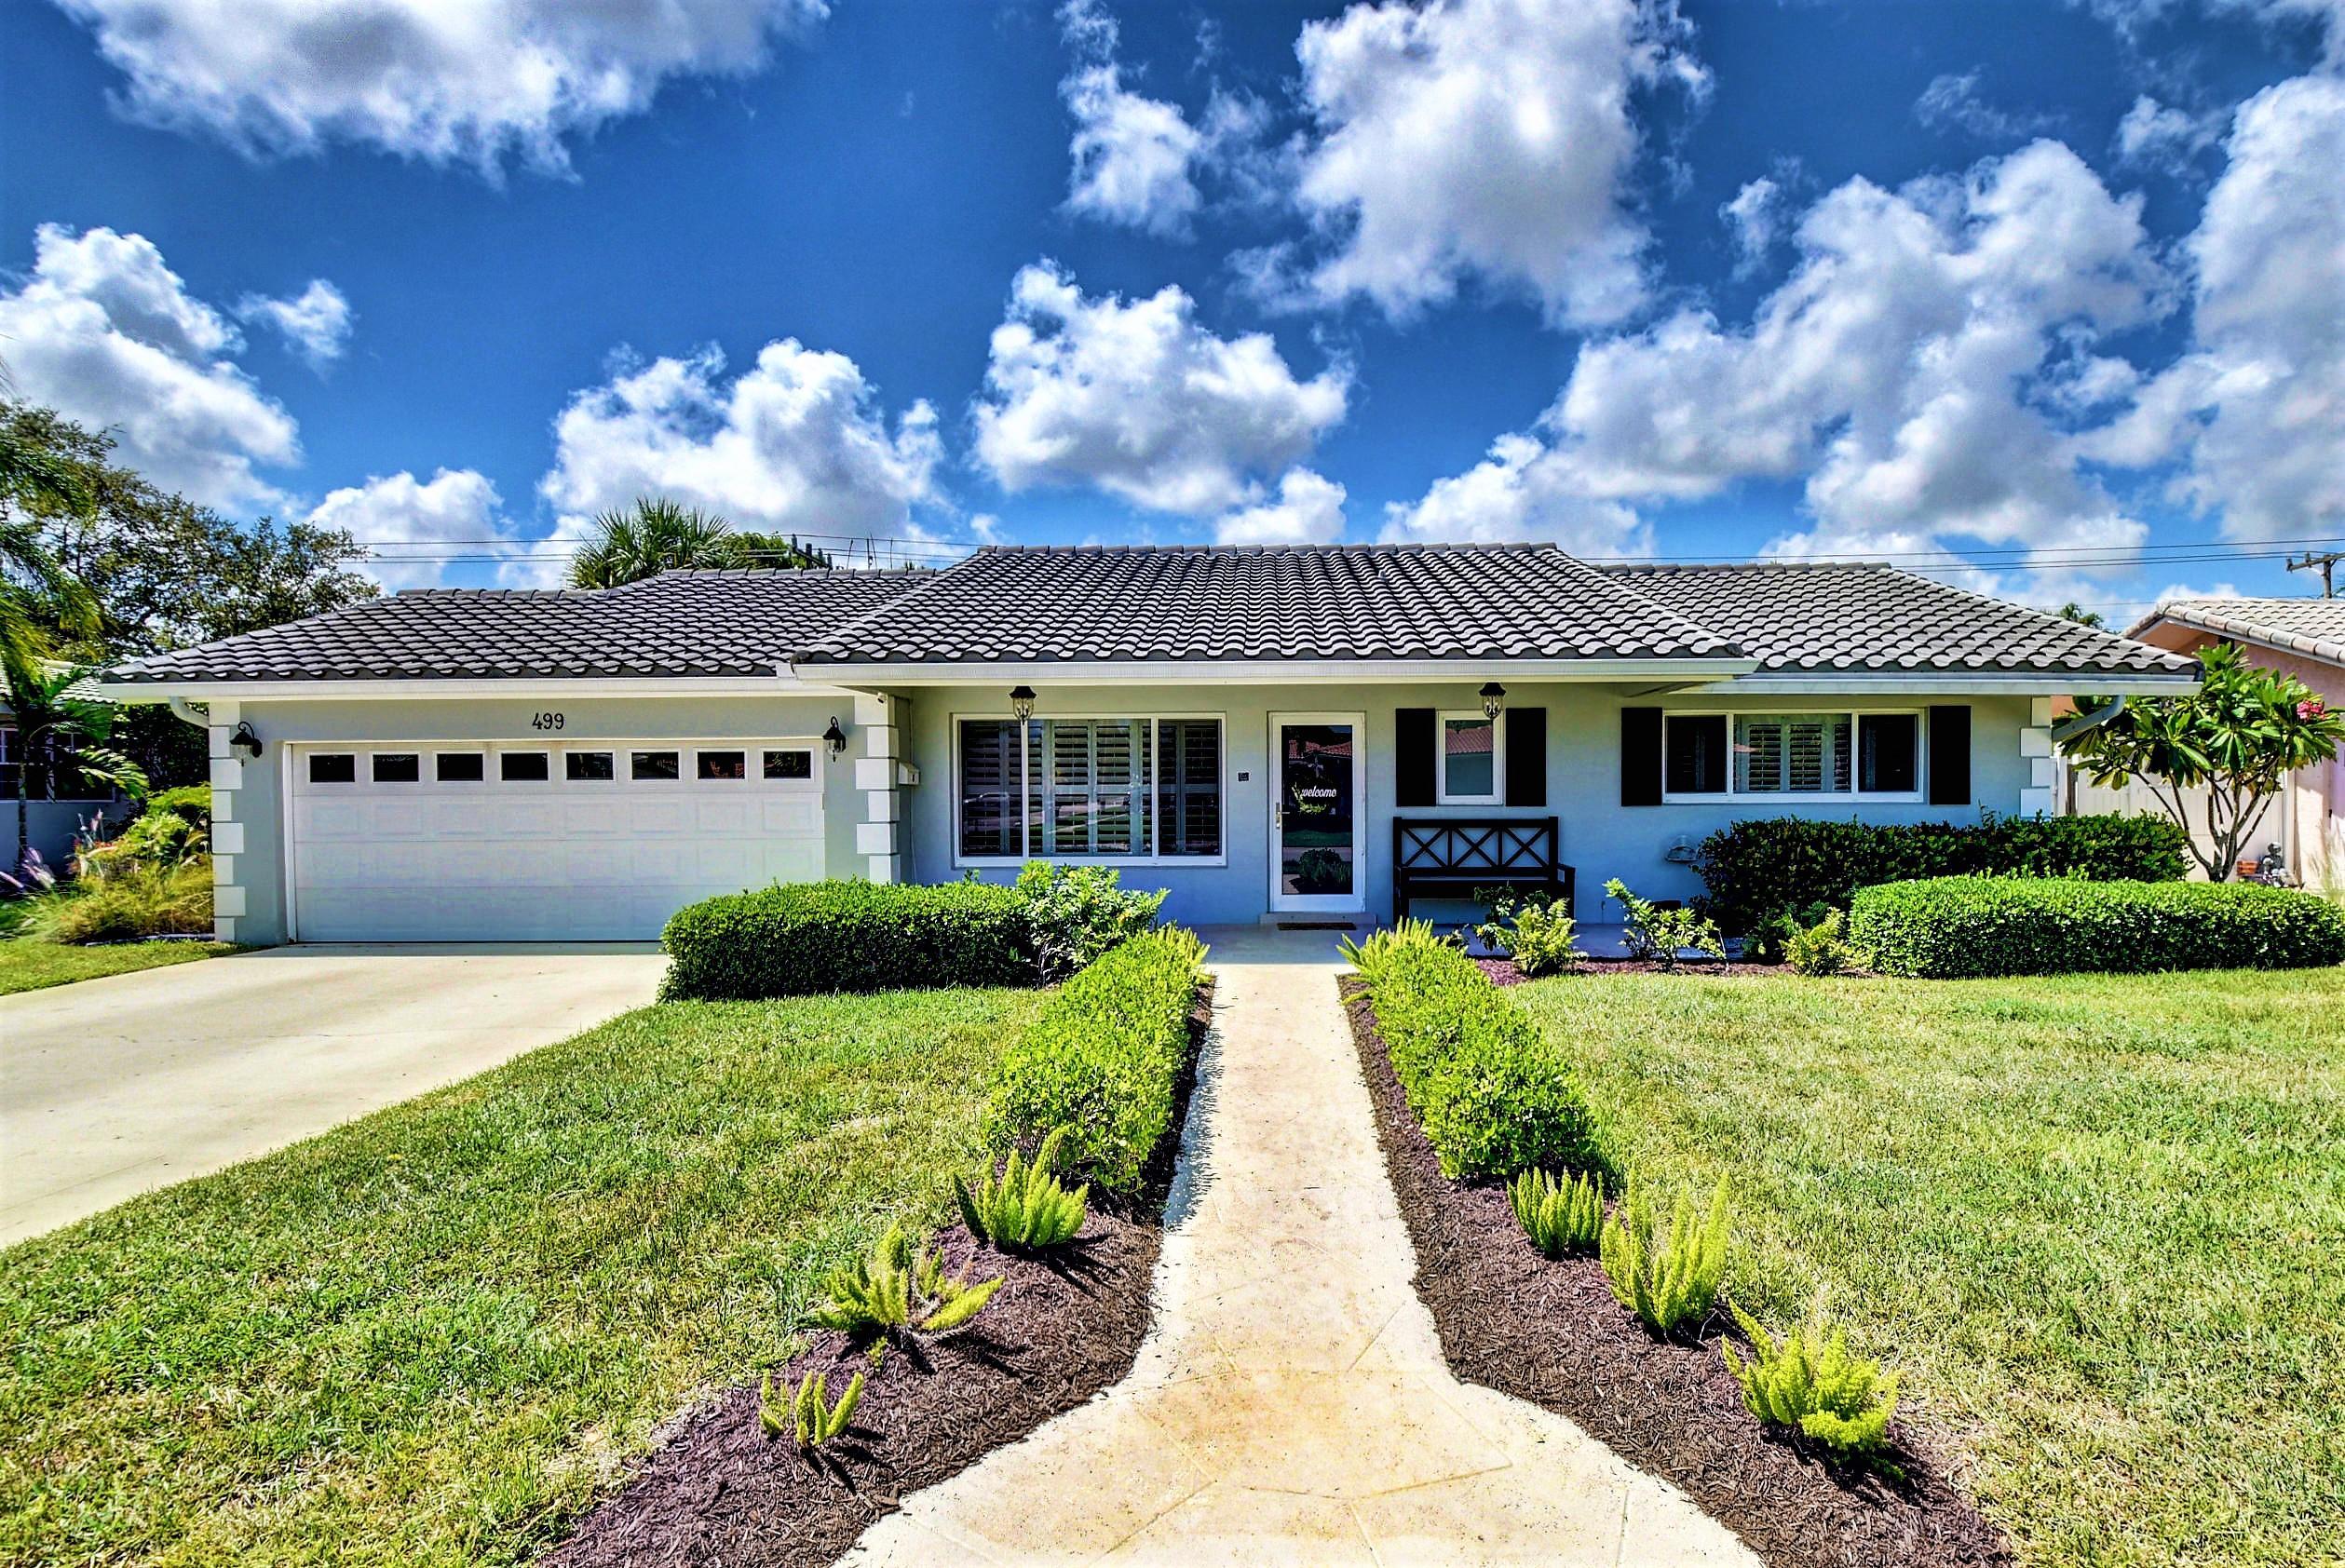 499 Sw 8th Terrace Boca Raton, FL 33486